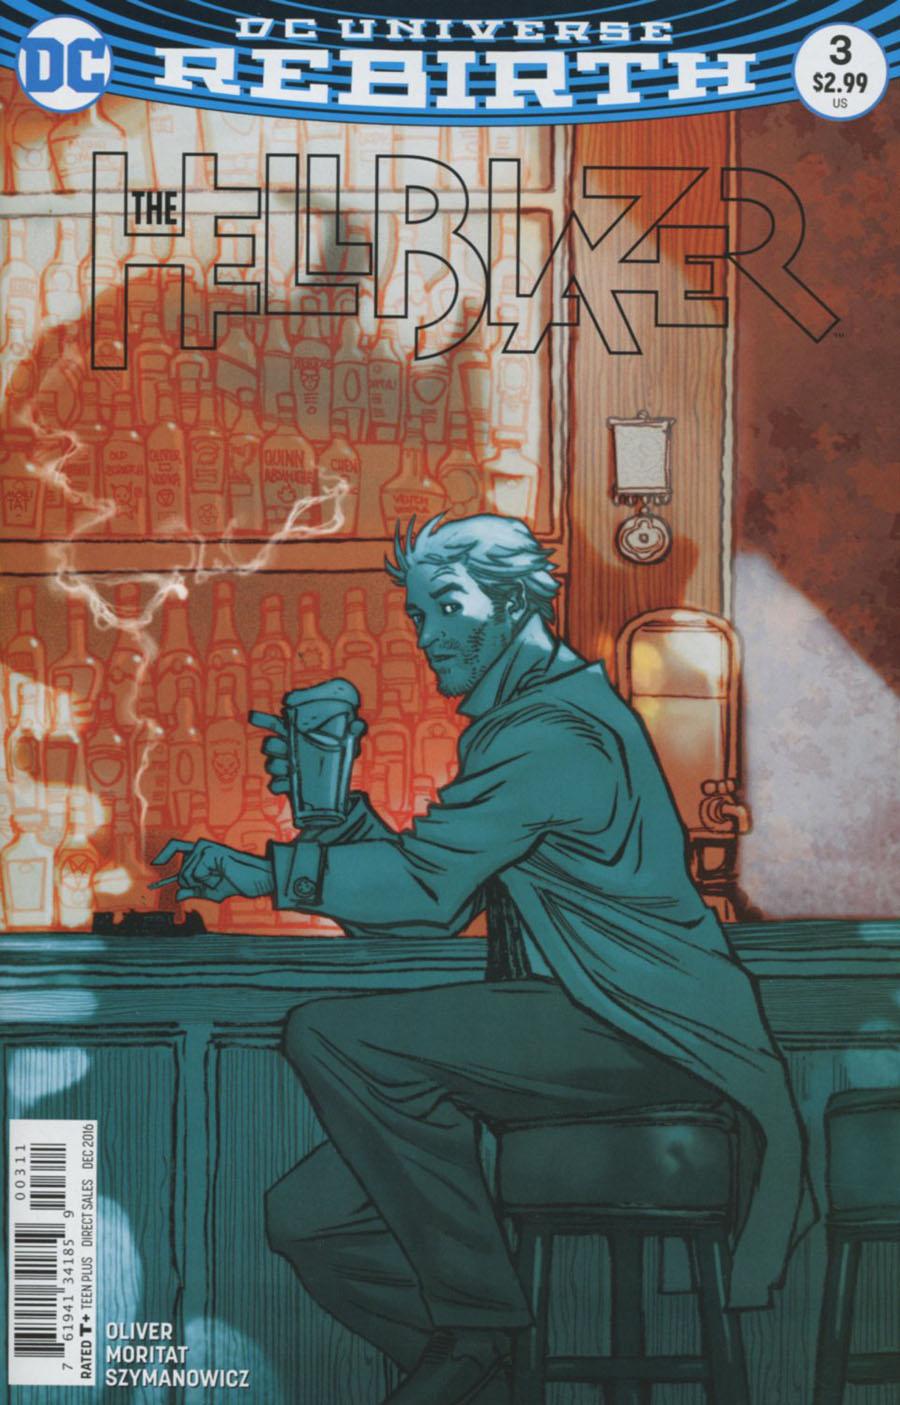 Hellblazer Vol 2 #3 Cover A Regular Moritat Cover